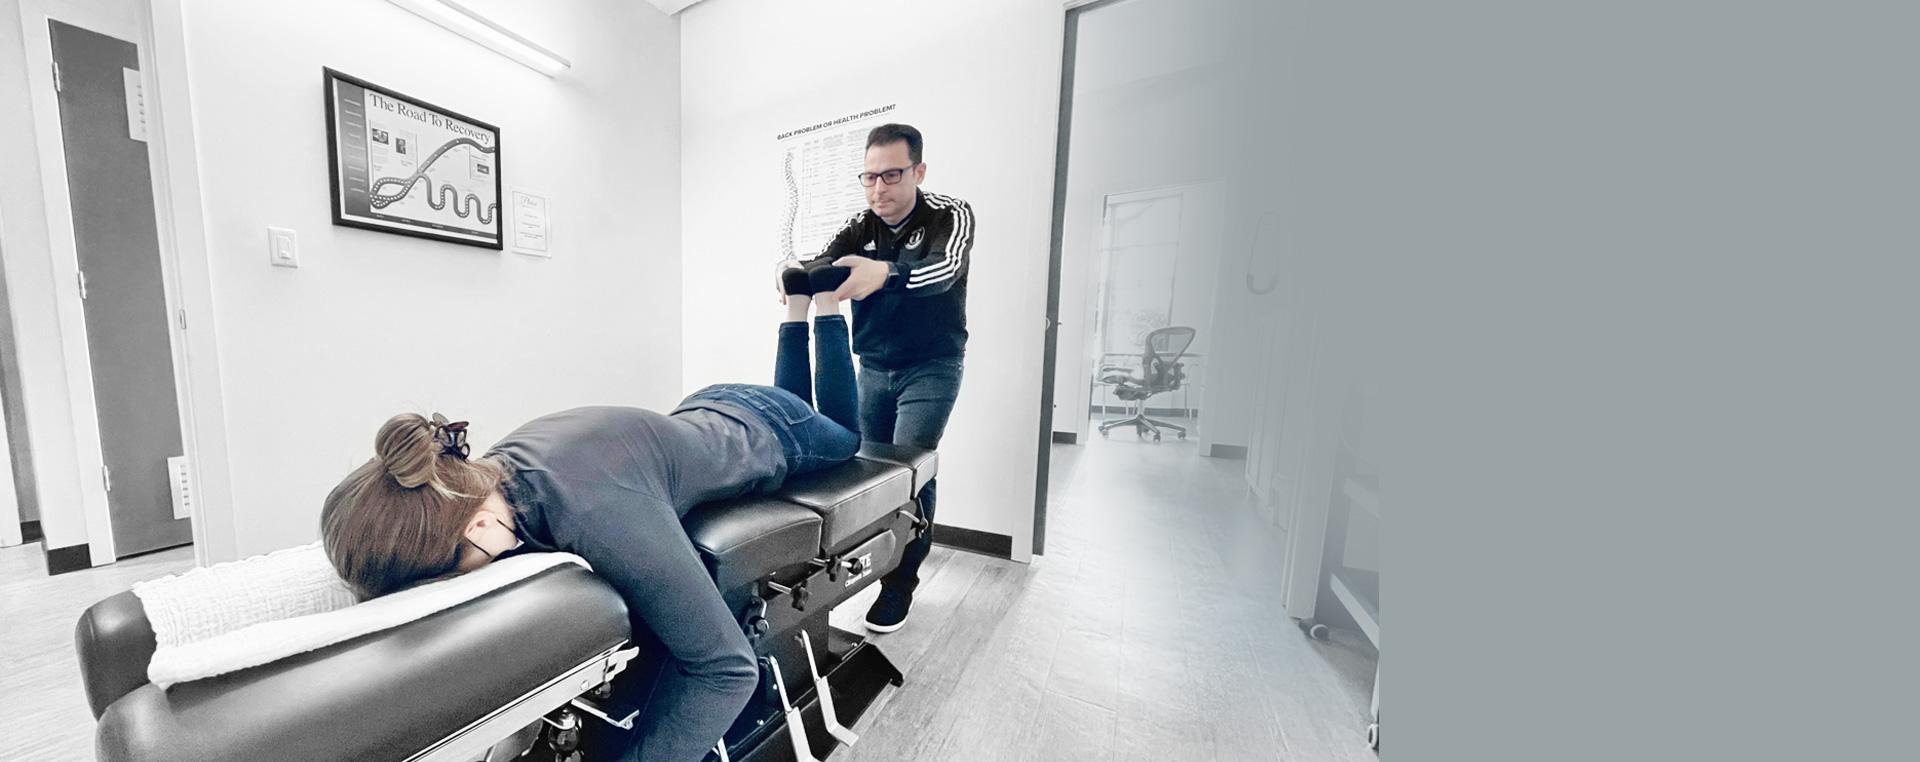 Dr. Barone checking members legs